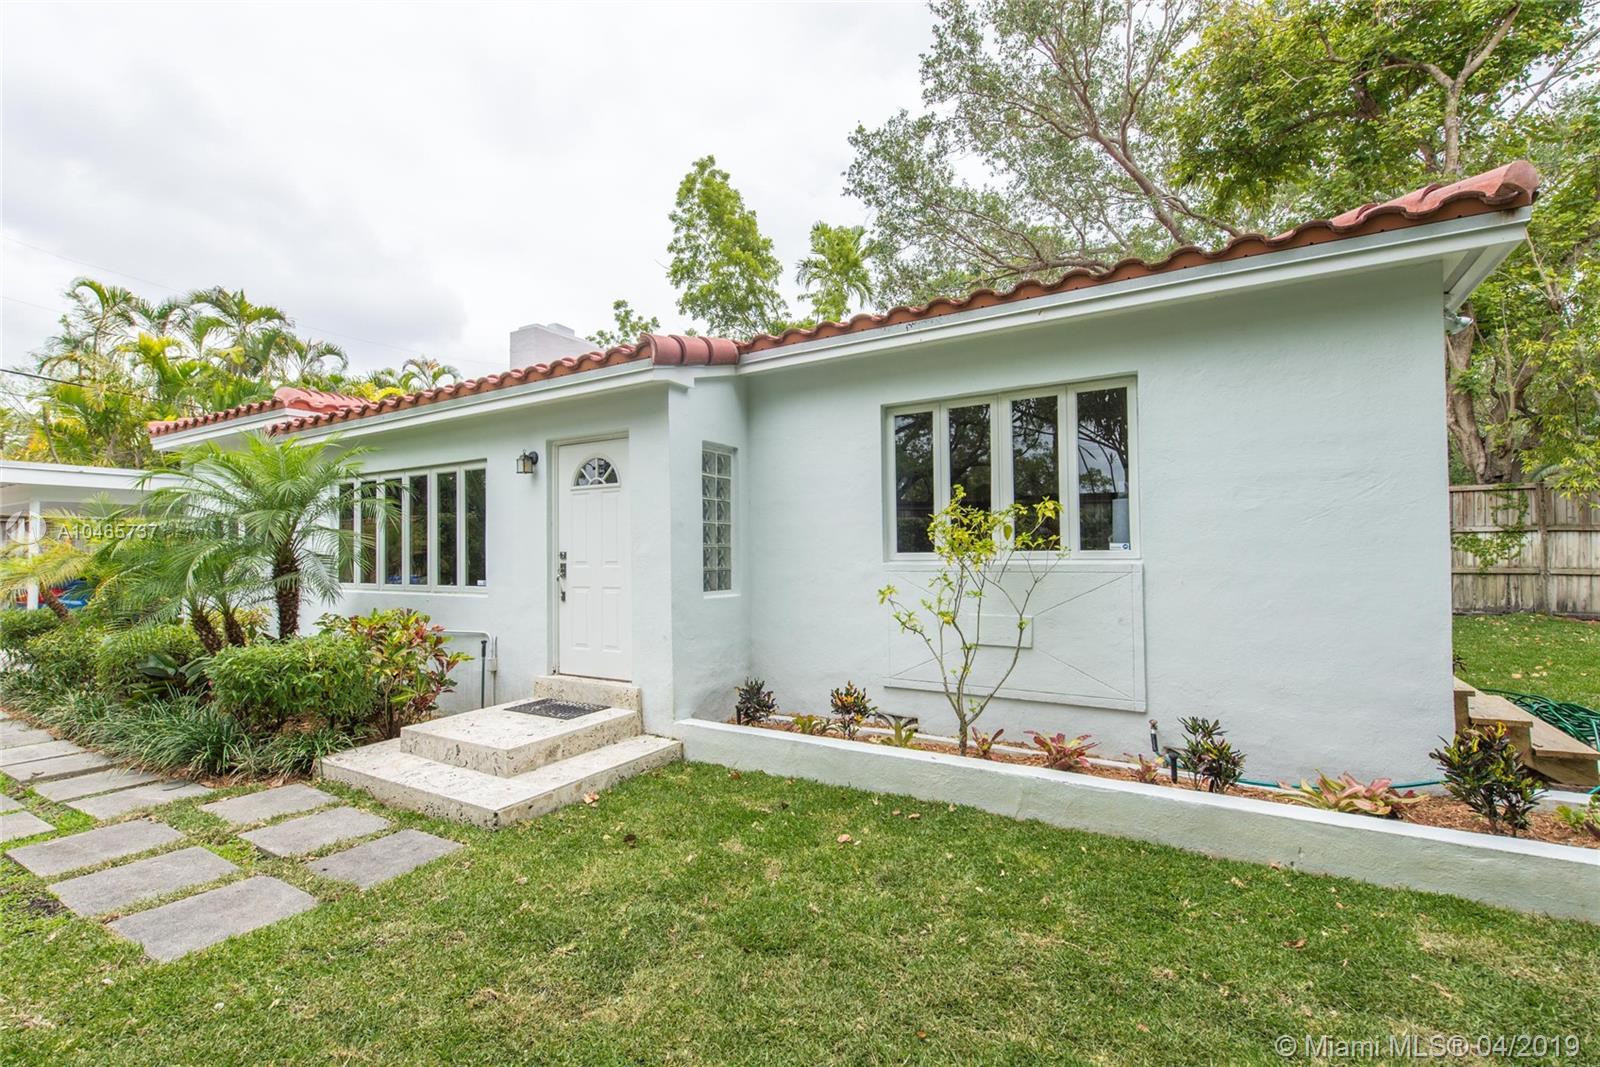 4225 S Le Jeune Rd, Coconut Grove FL, 33133